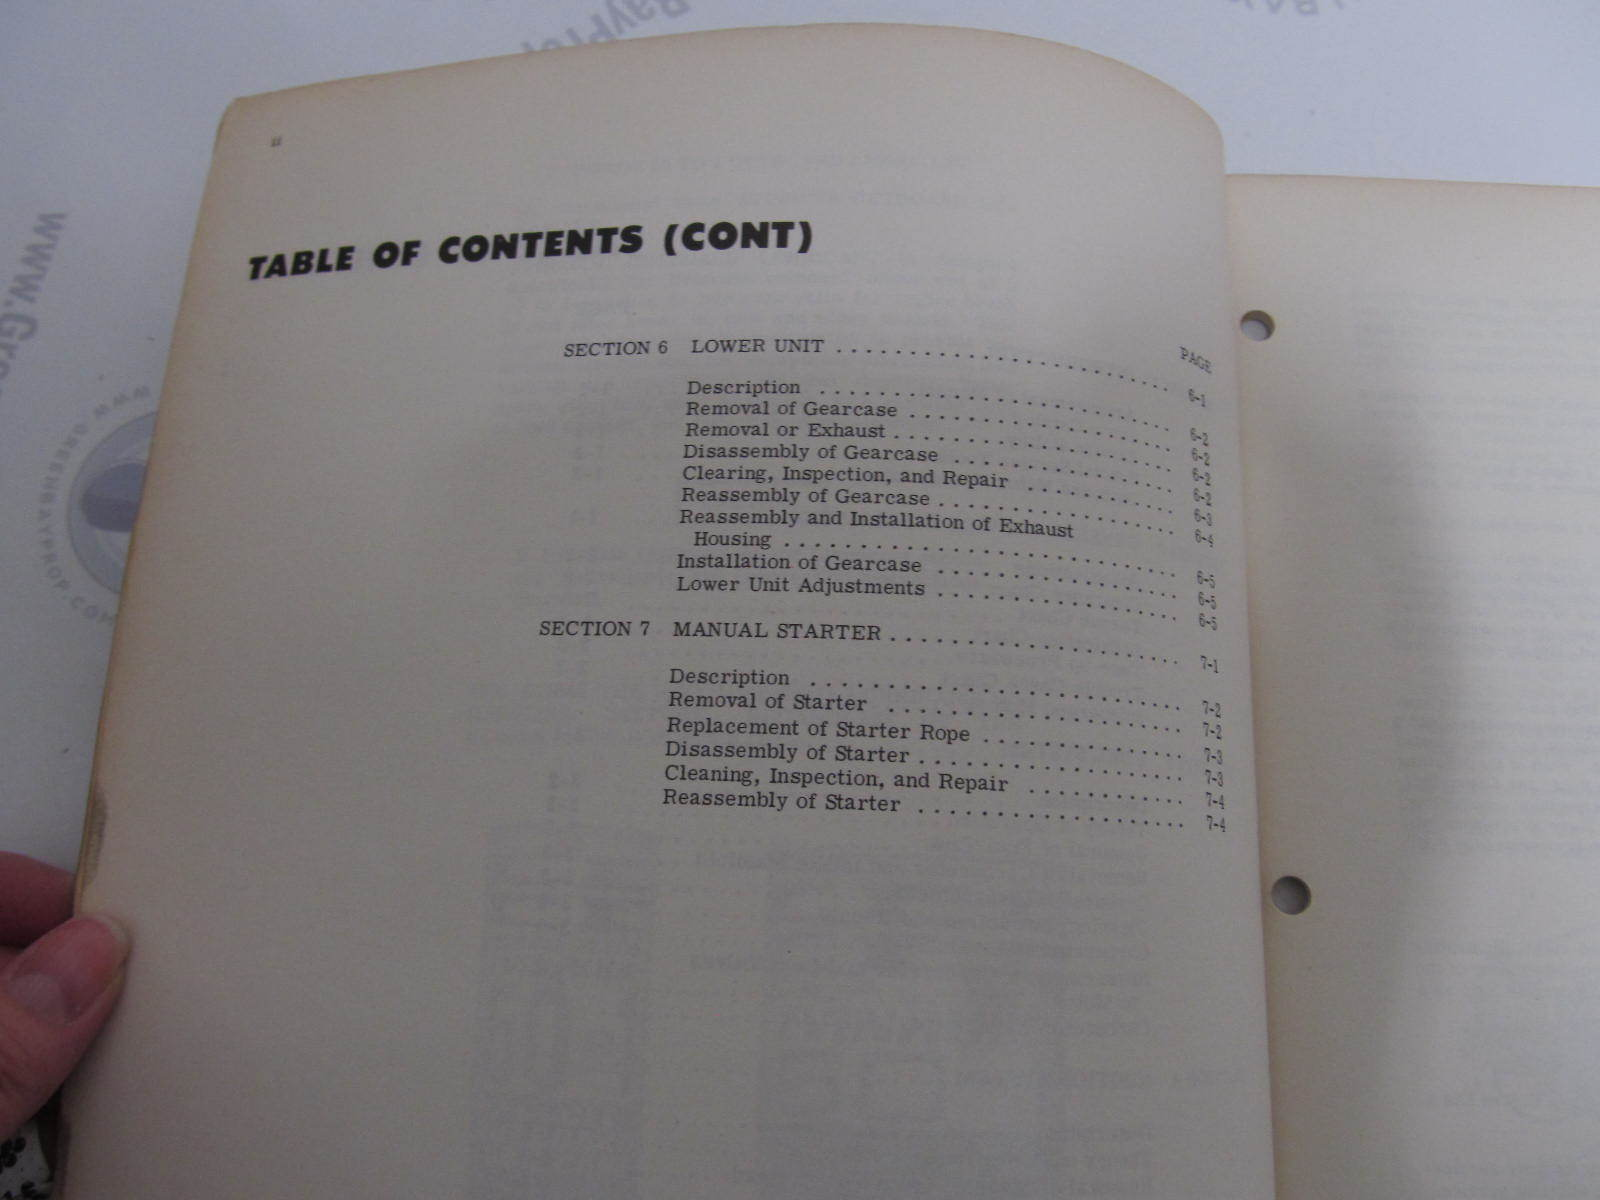 1971 Evinrude Outboard Service Manual 2 HP Mate 2102